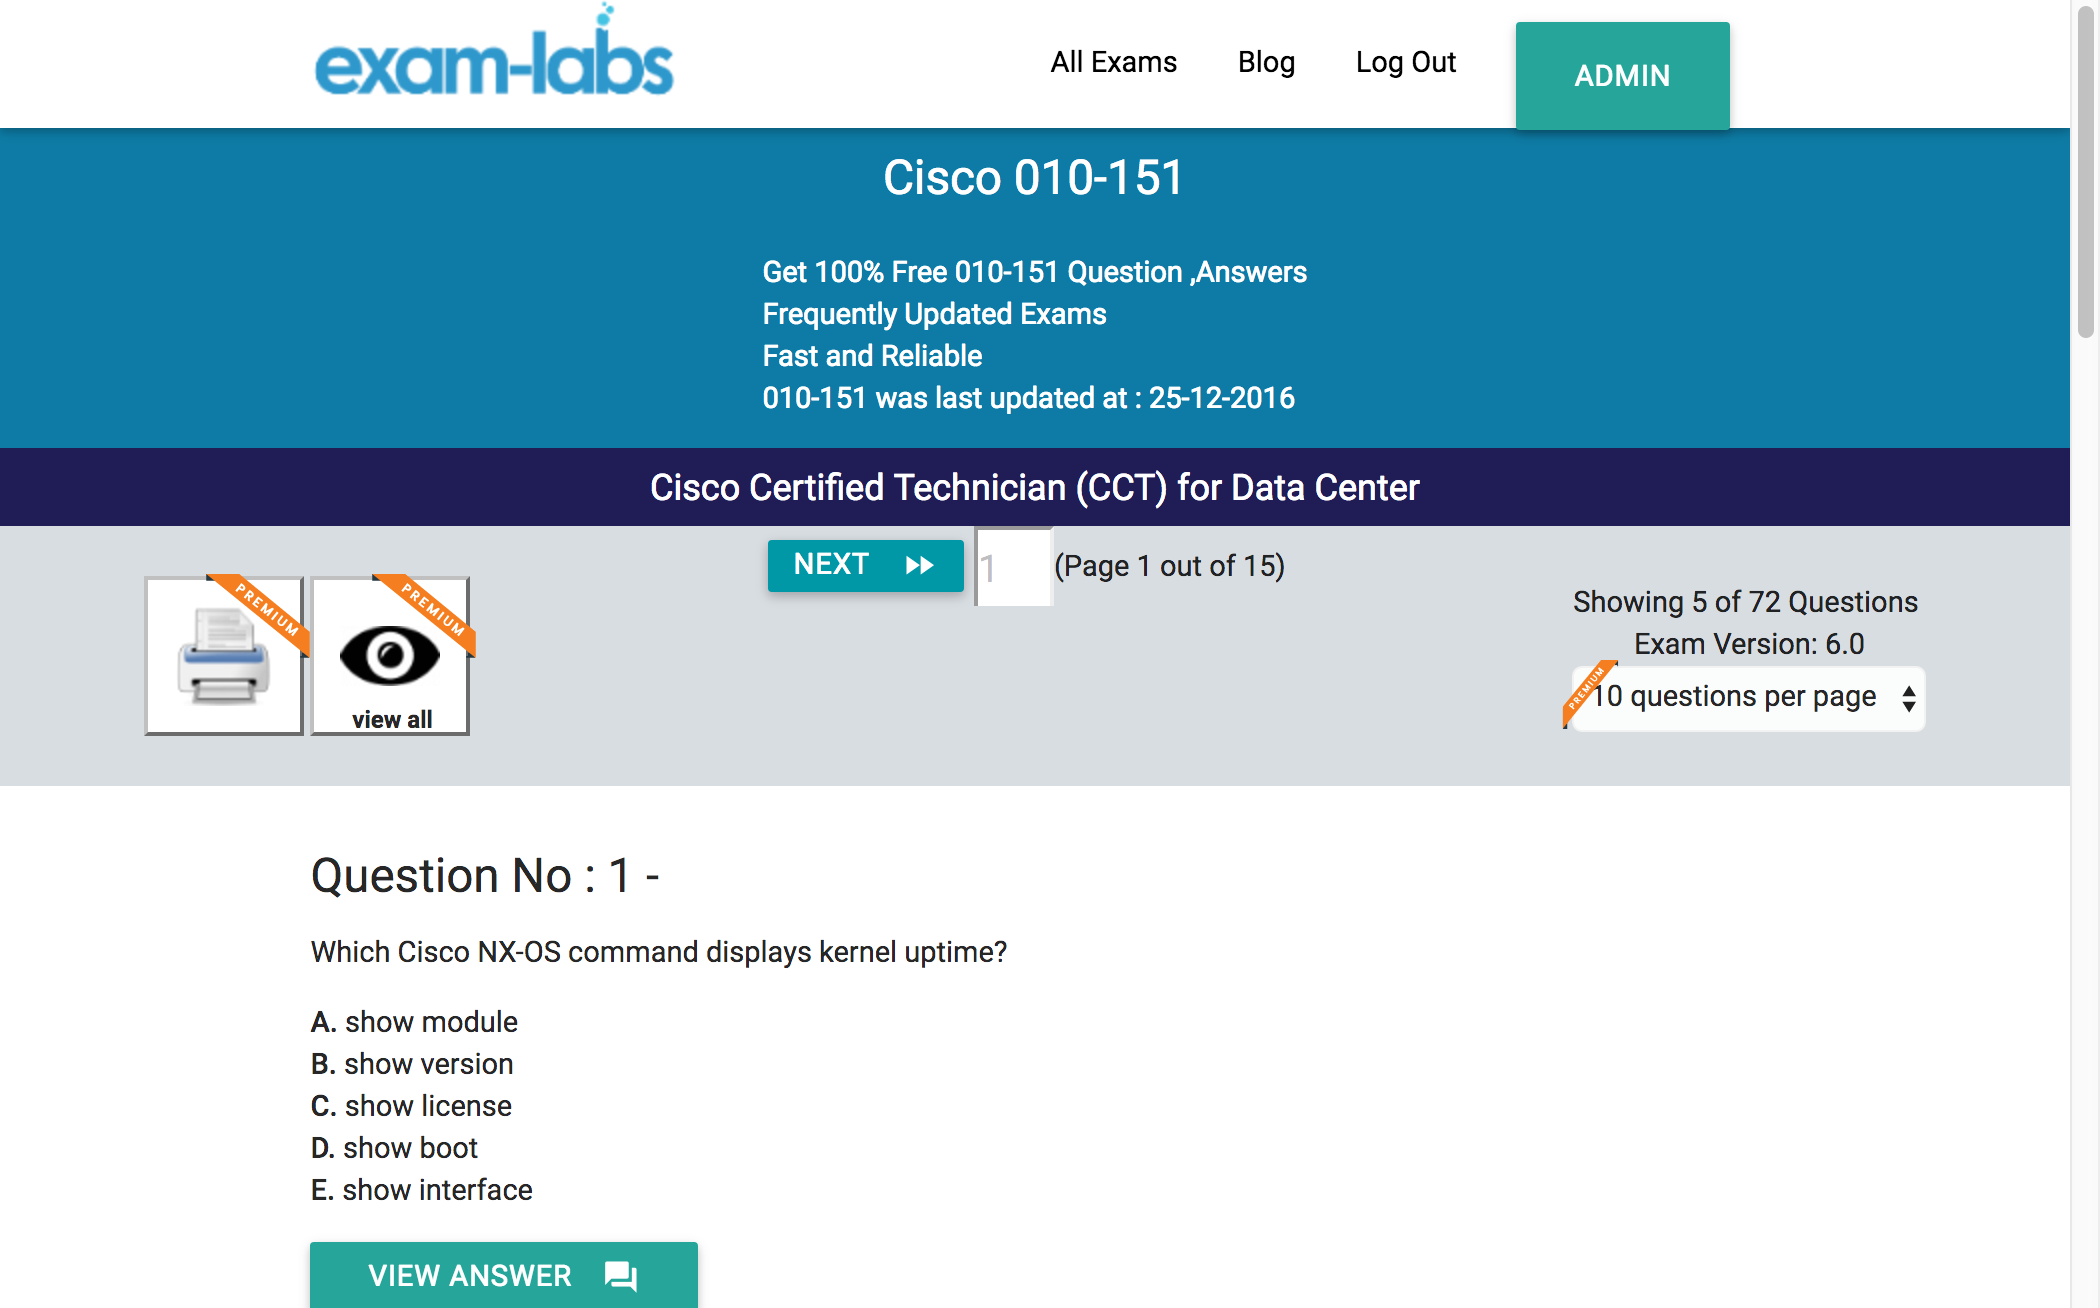 010 151 cisco practice exam questions 100 free exam labs cisco 010 151 cisco certified technician cct for data center exam xflitez Gallery